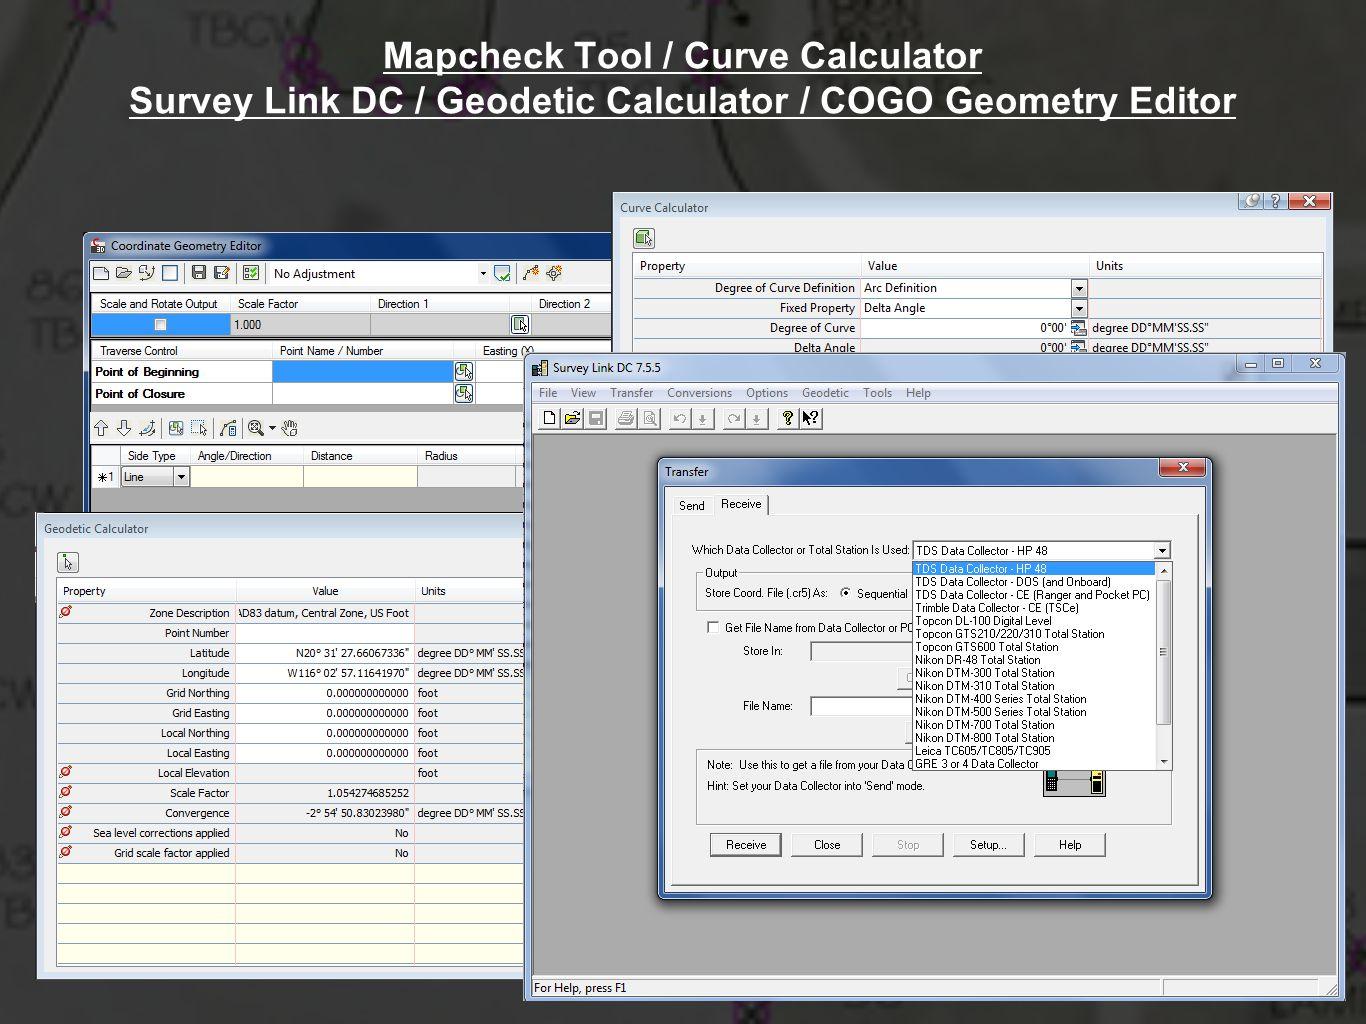 Mapcheck Tool / Curve Calculator Survey Link DC / Geodetic Calculator / COGO Geometry Editor